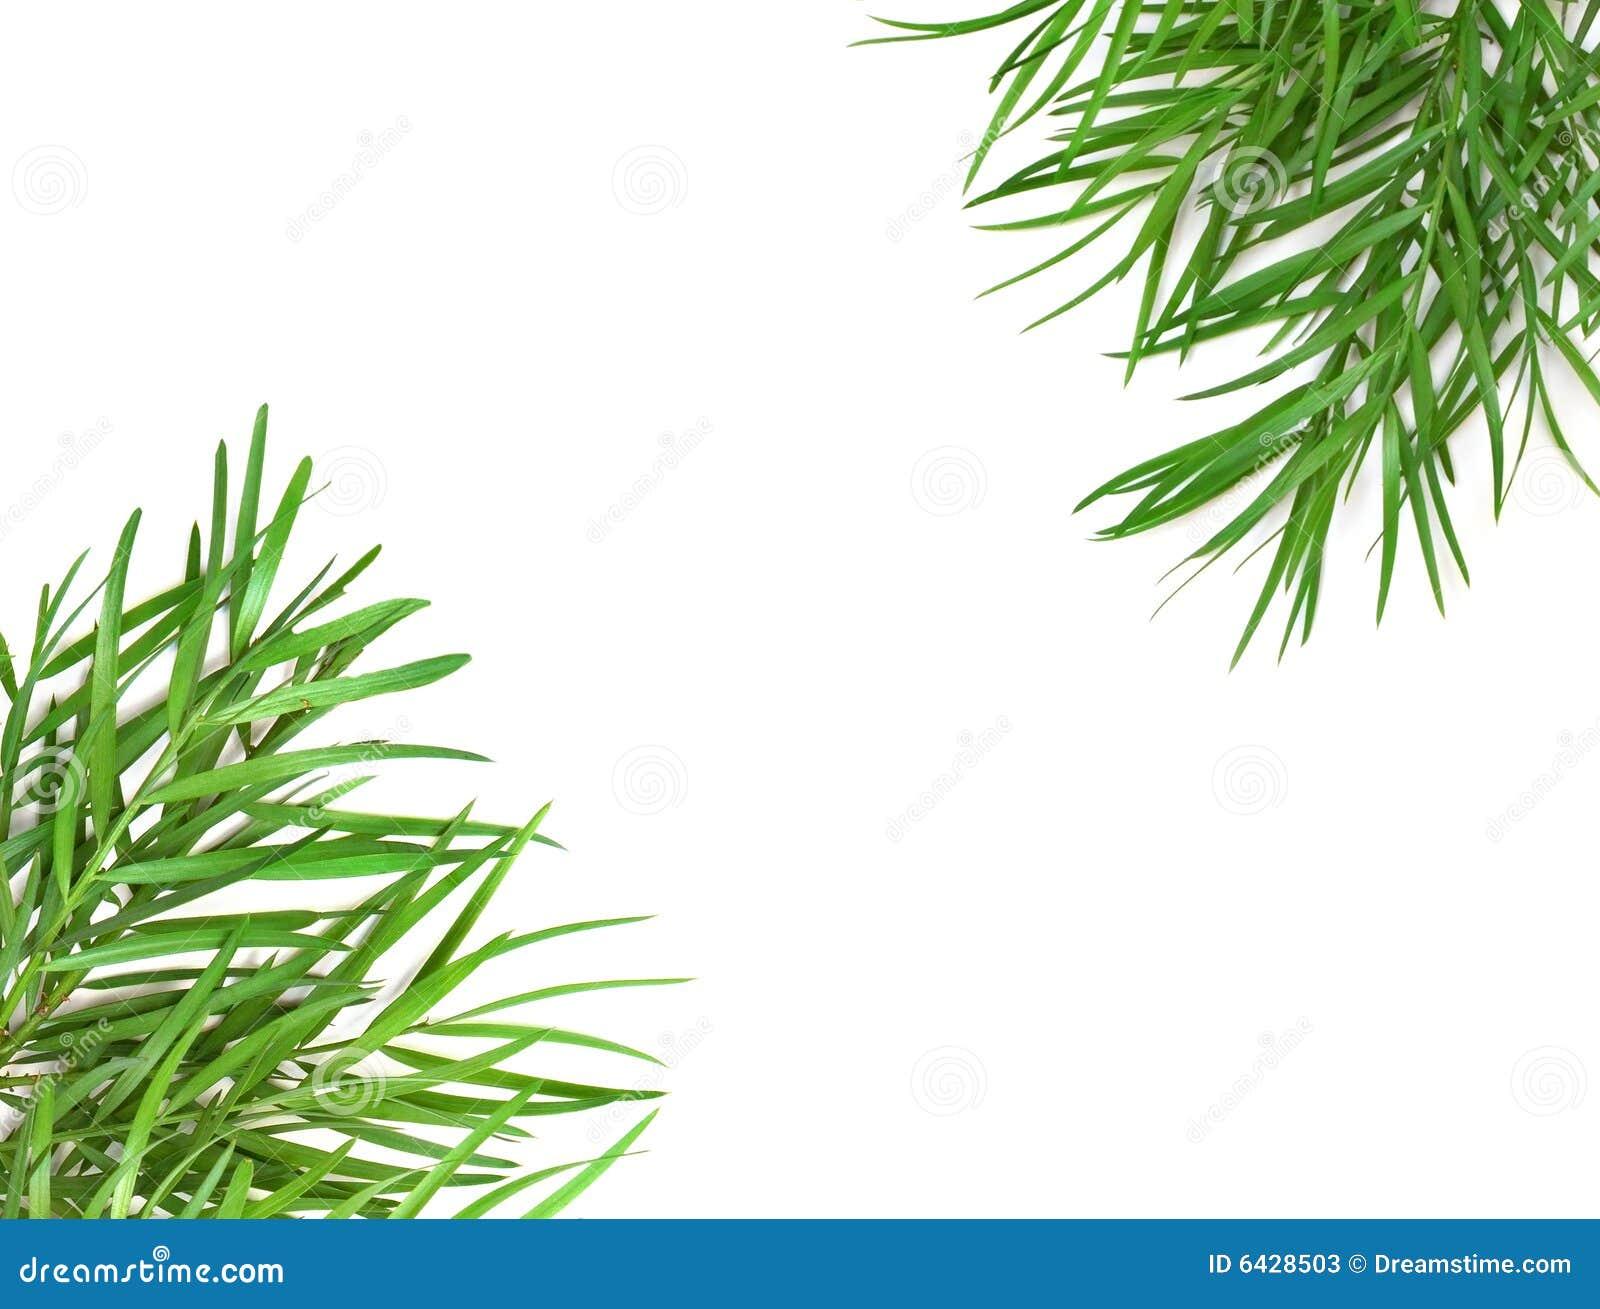 green leaf border stock image image of green stationery